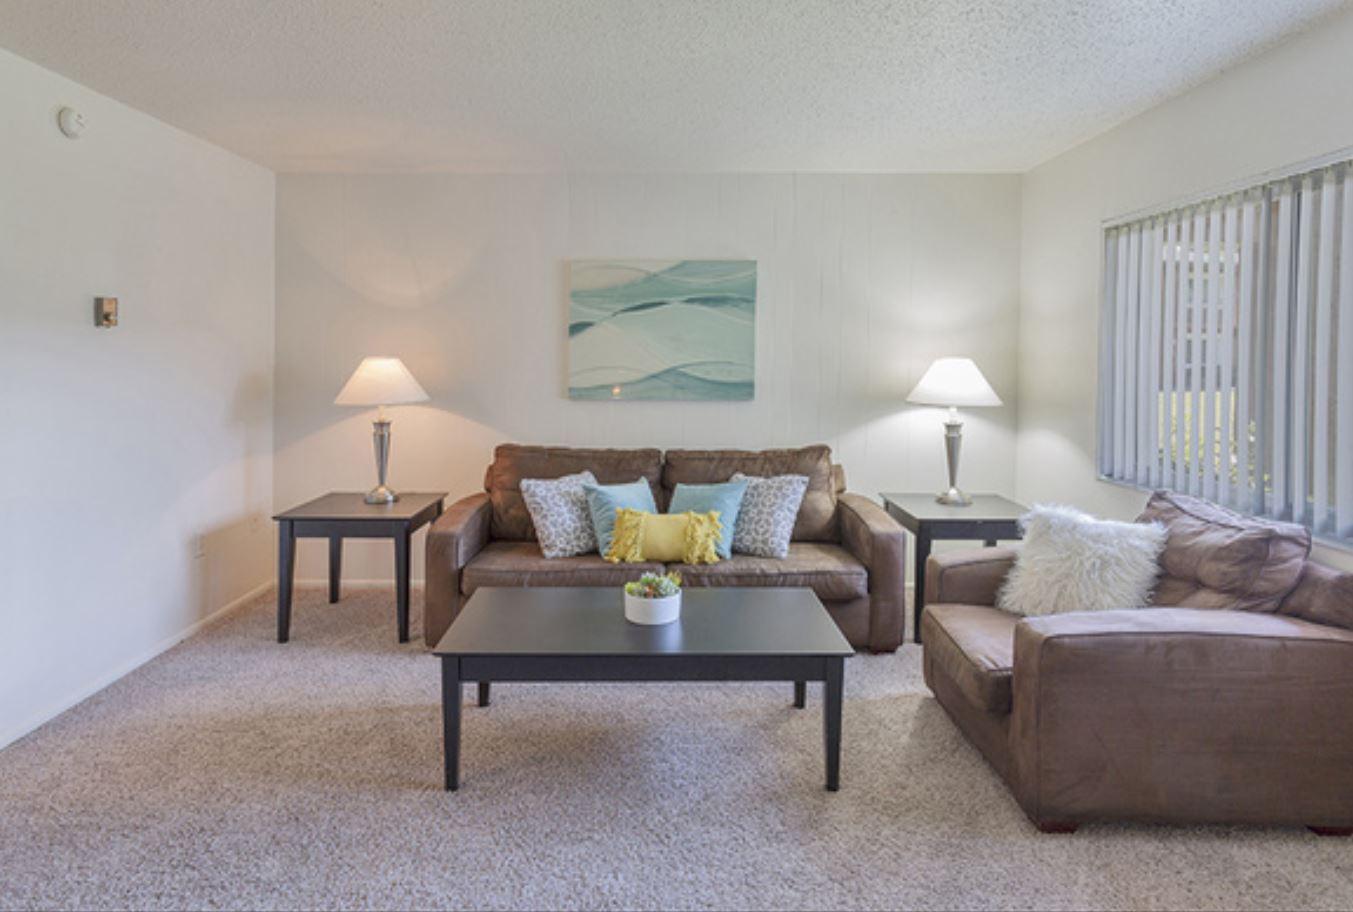 Apartments Near Full Sail Indigo Winter Park for Full Sail University Students in Winter Park, FL